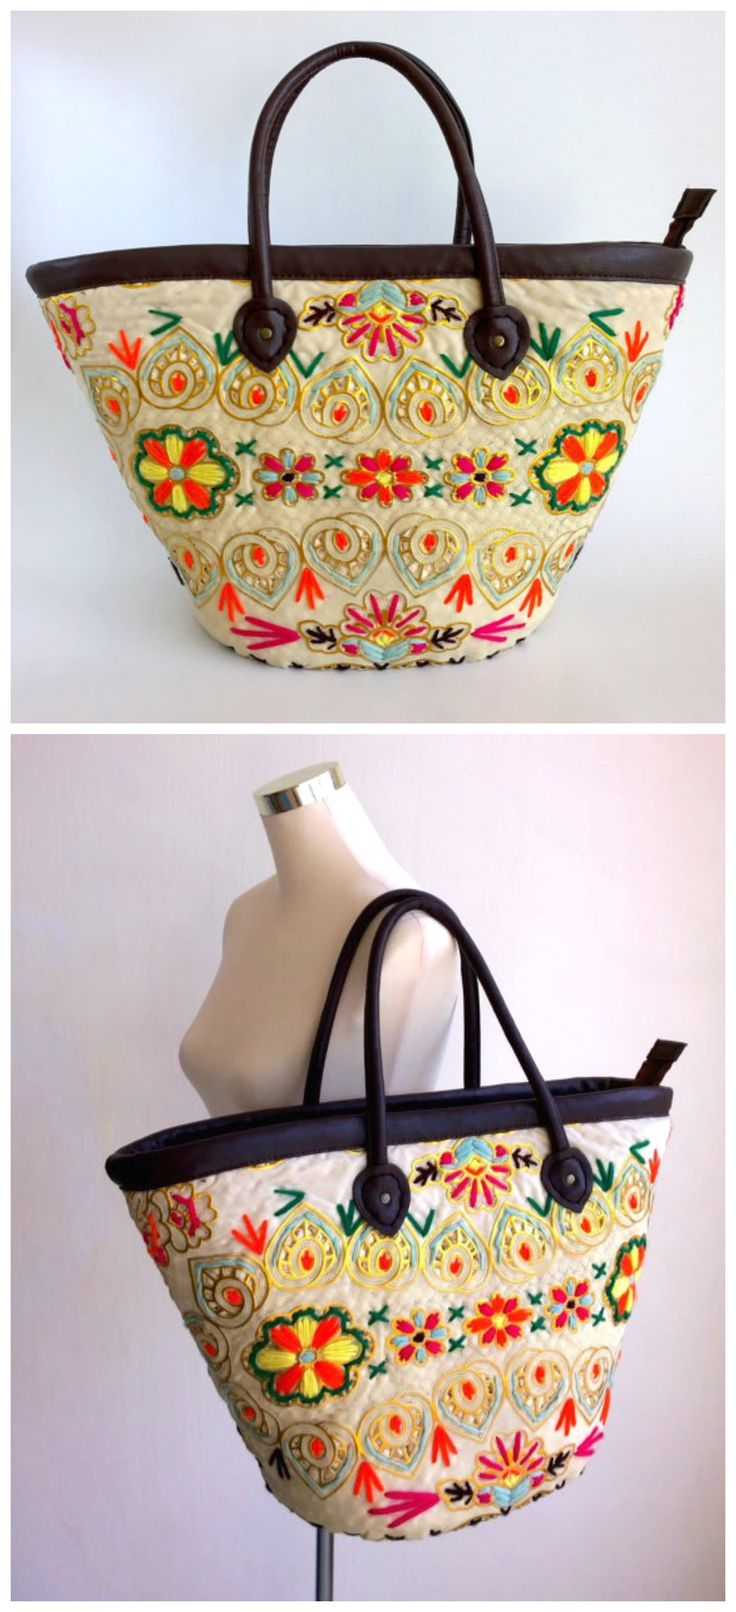 Boho Basket Bag - Raffia Drawstring Bag - Tote bag